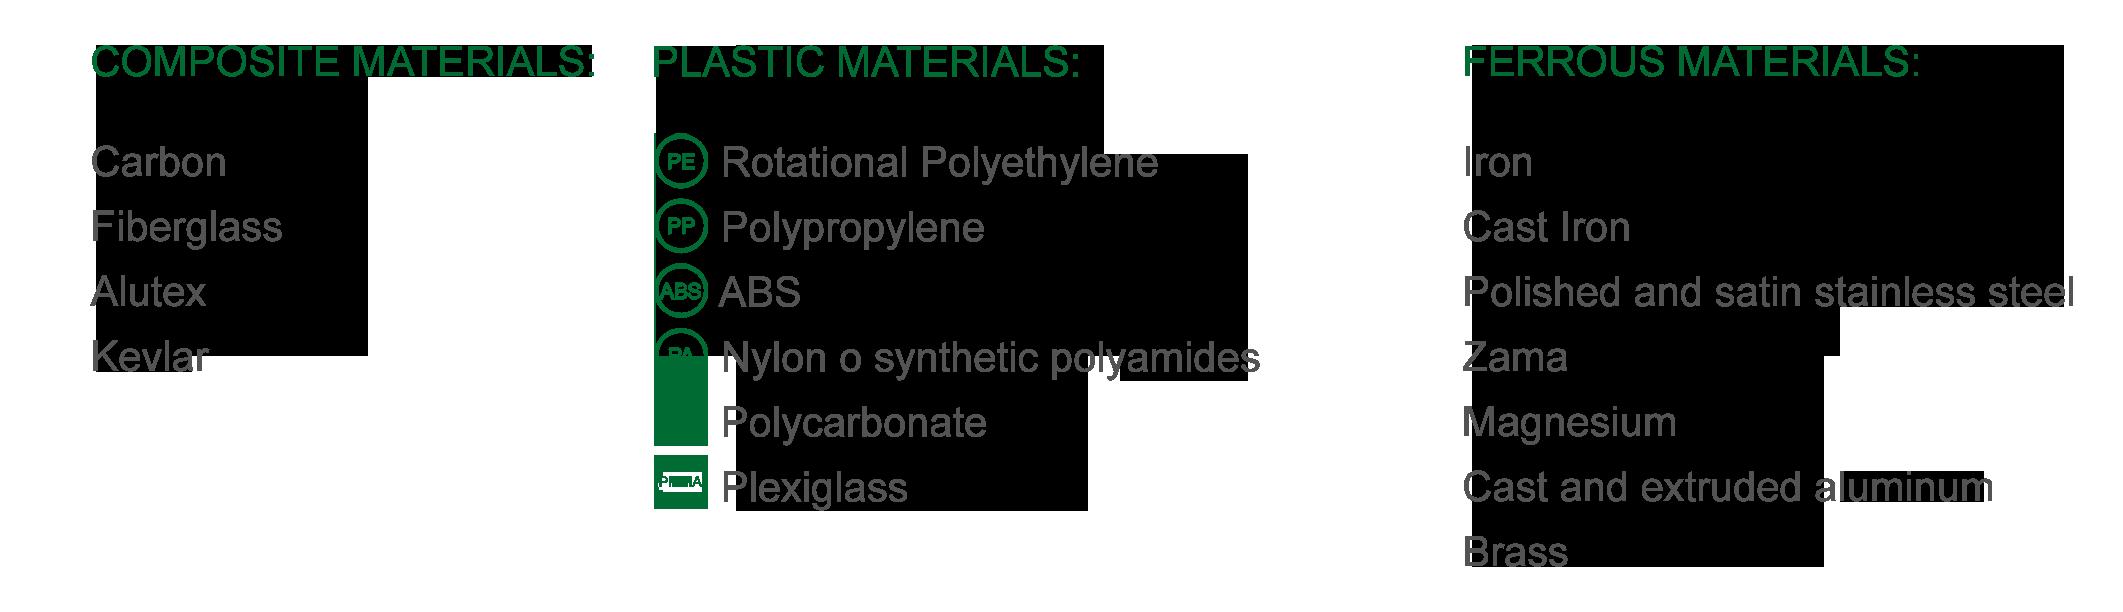 materiali-1-en